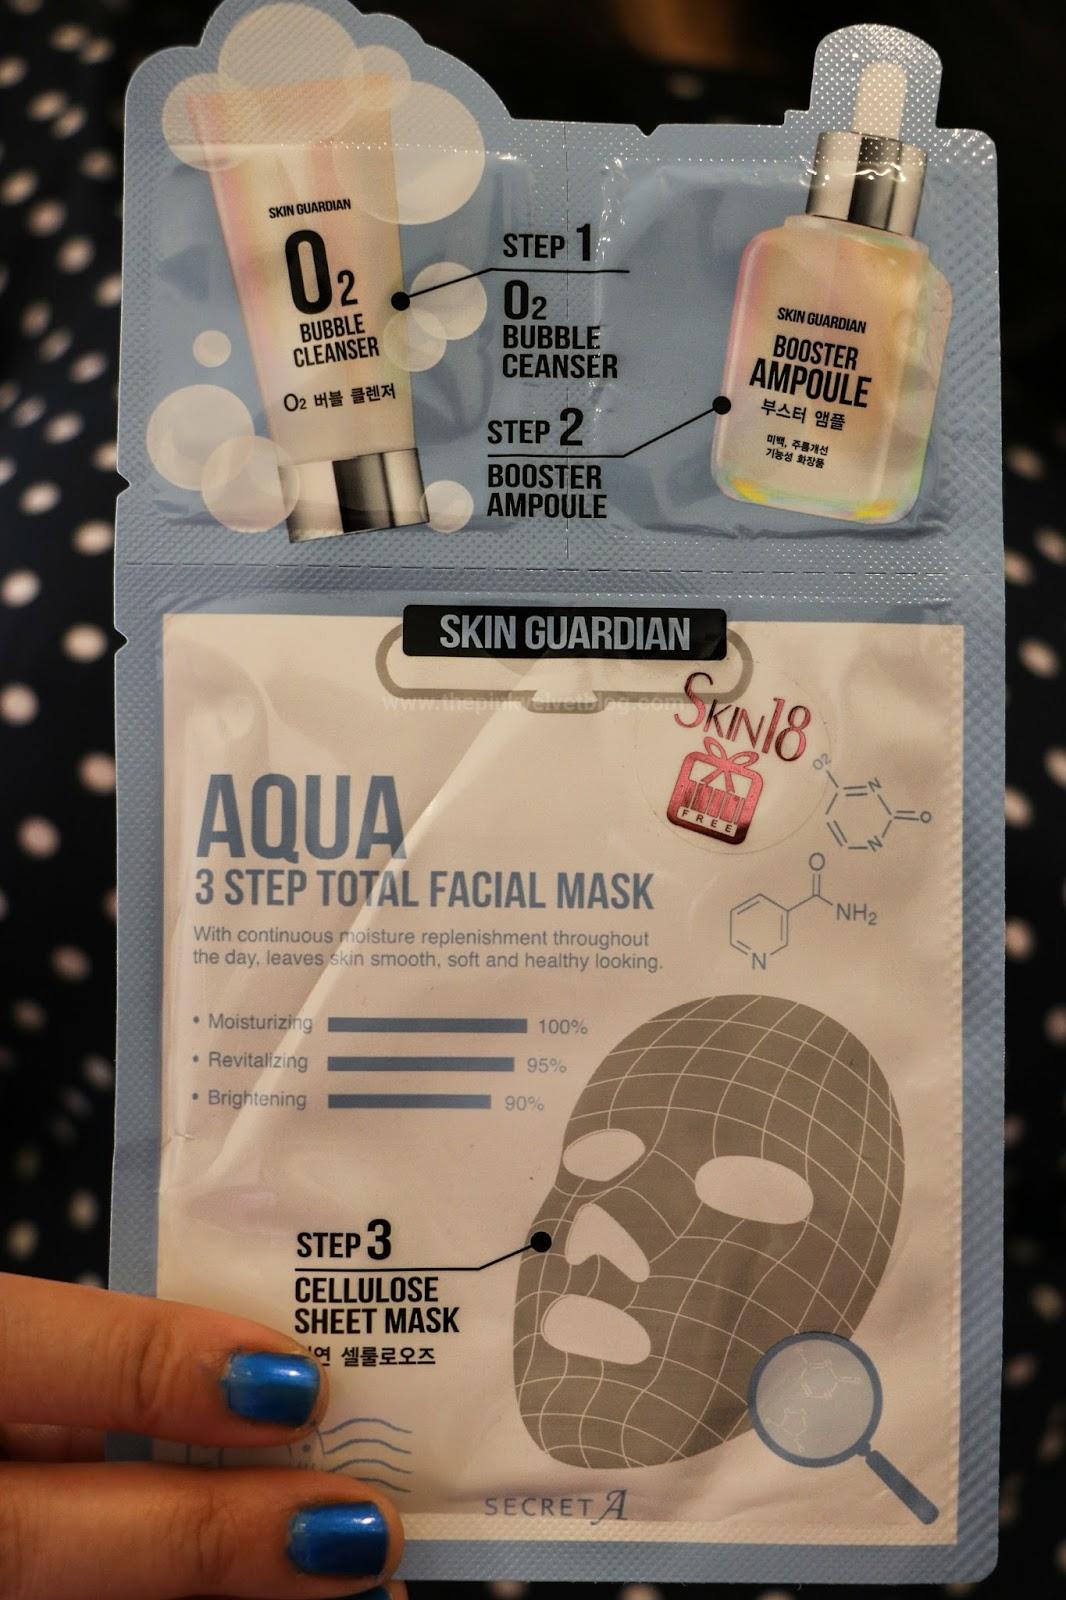 Skin18 Aqua Sheet Mask